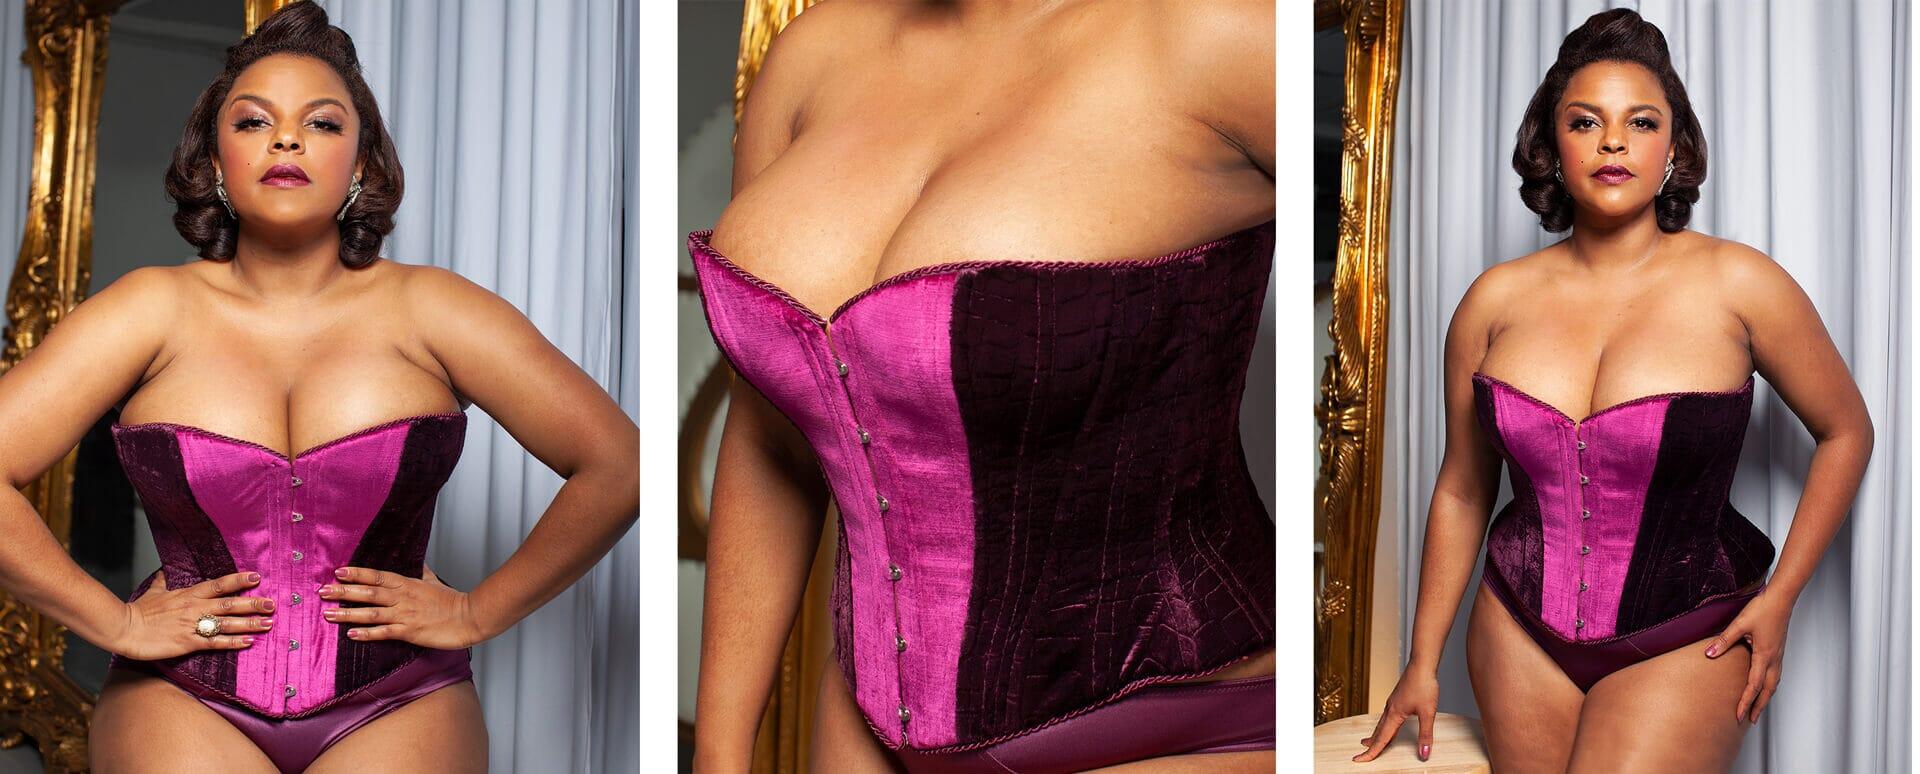 Different poses of Jenny Rieu Wearing Somptueux Rieu corset